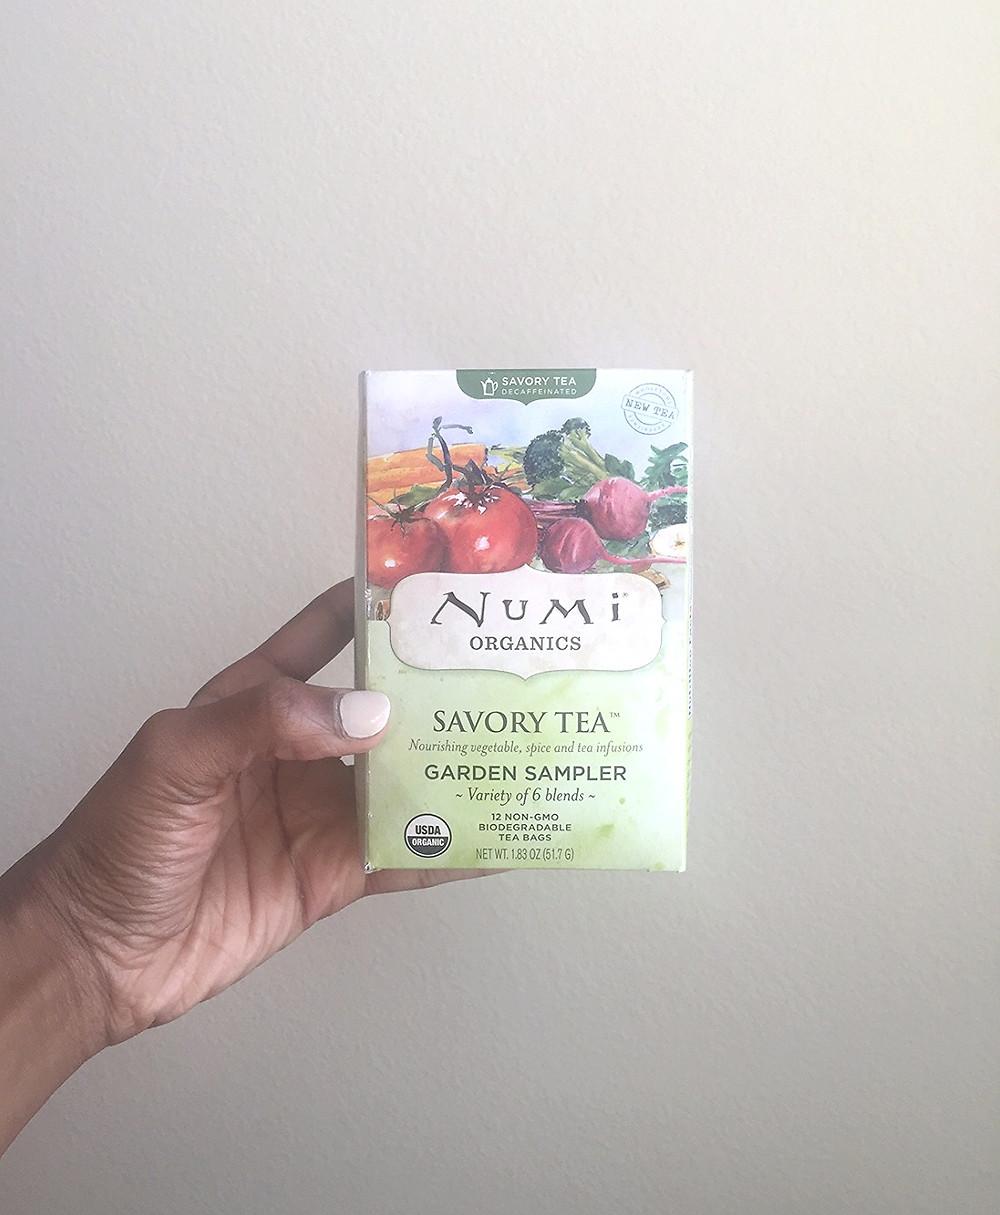 Numi Organics Savory Tea